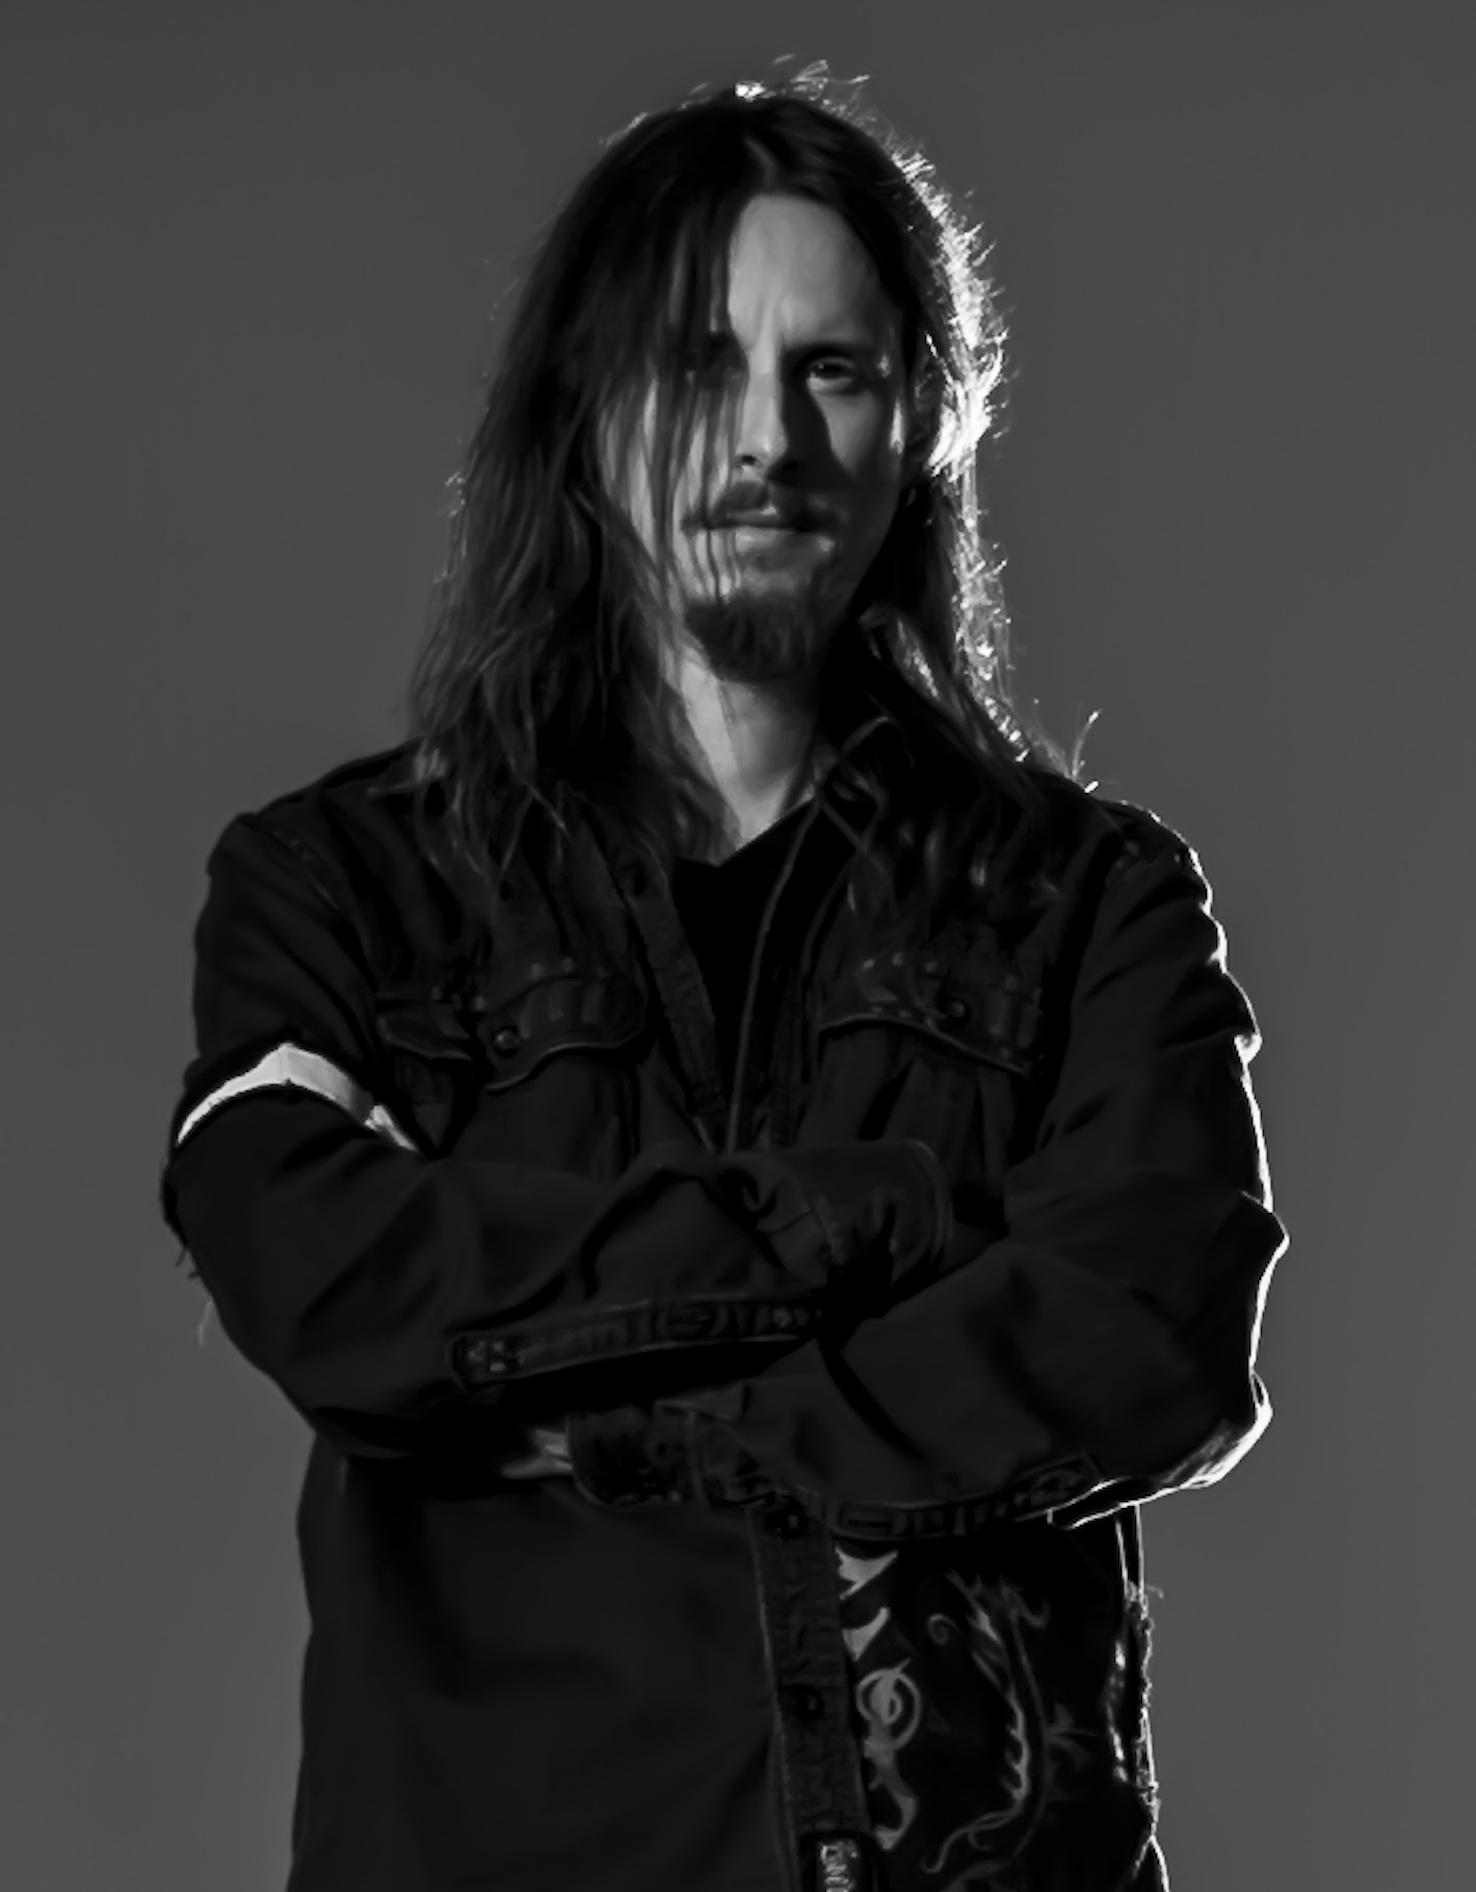 Rikard Z photo by Patric Ullaeus